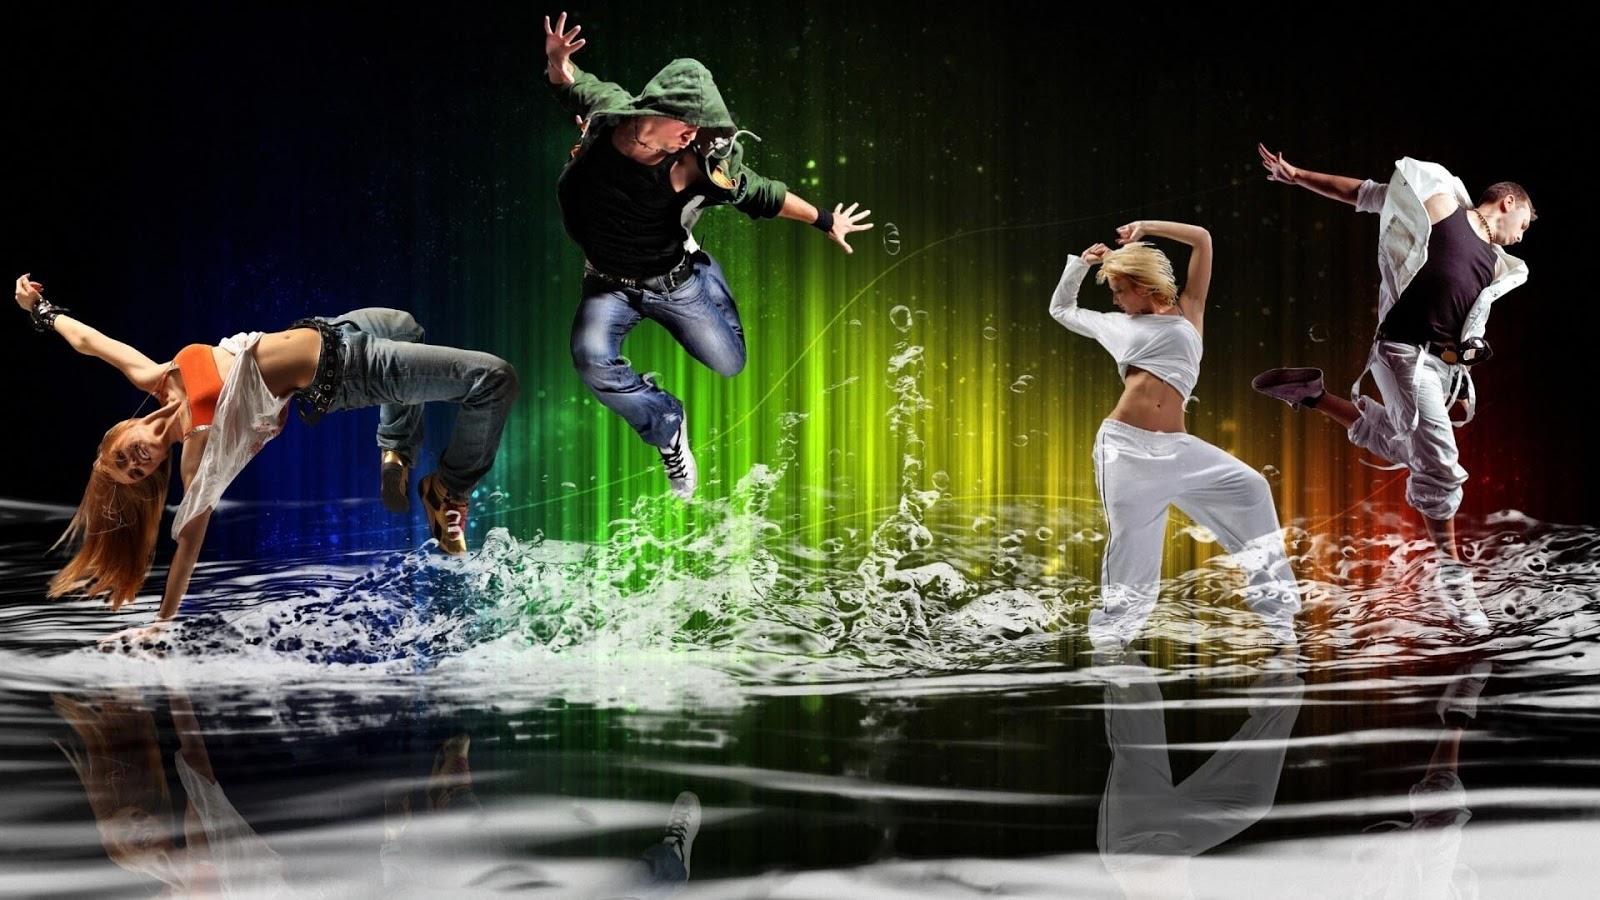 Dance Wallpaper Hd   Dance Energy 113023   HD Wallpaper Download 1600x900